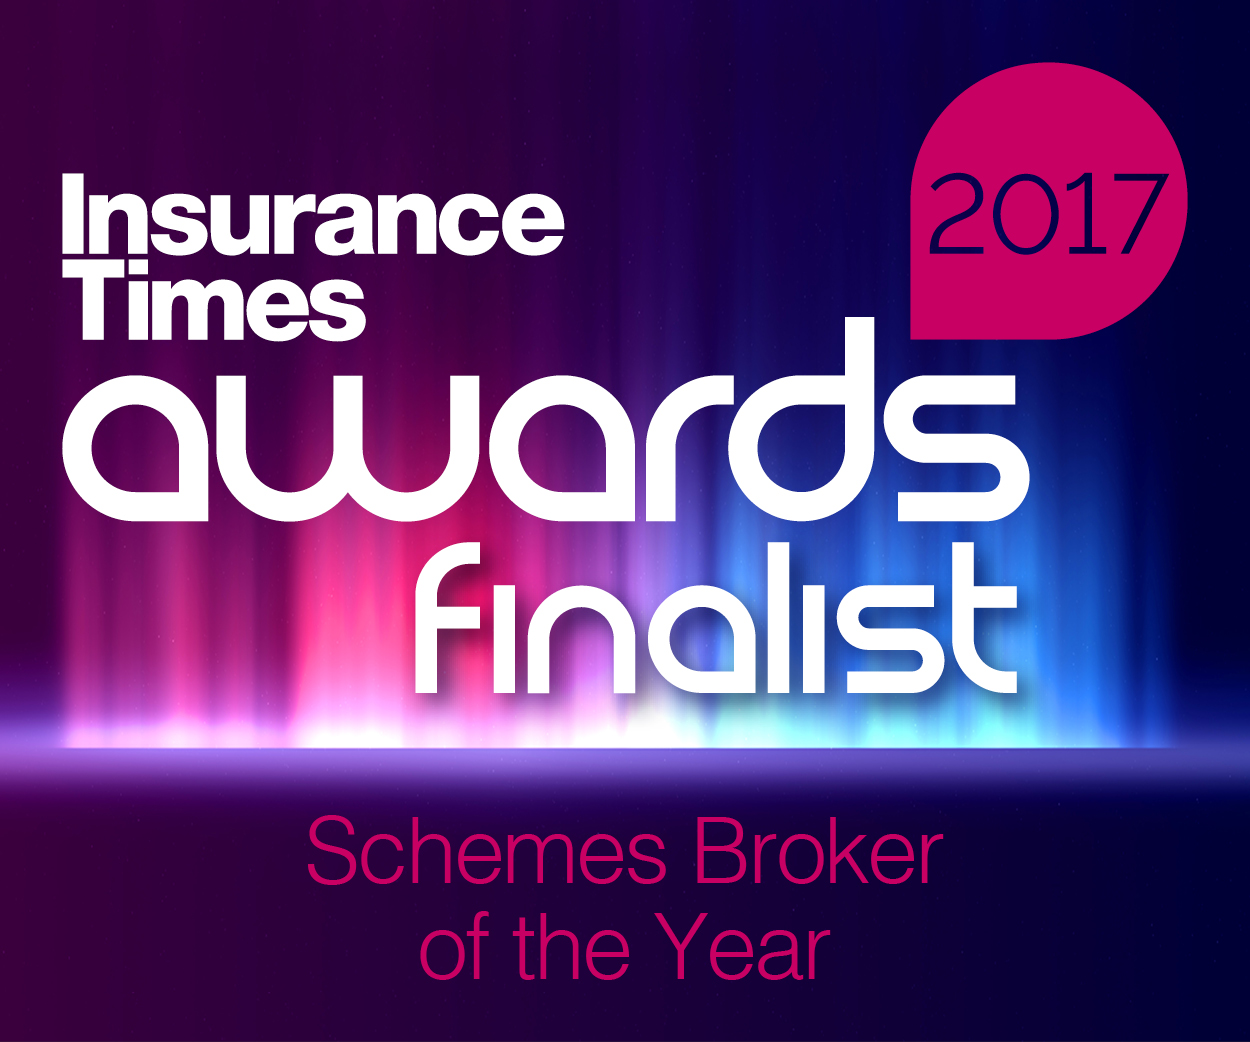 Insurance Times Award - Finalist